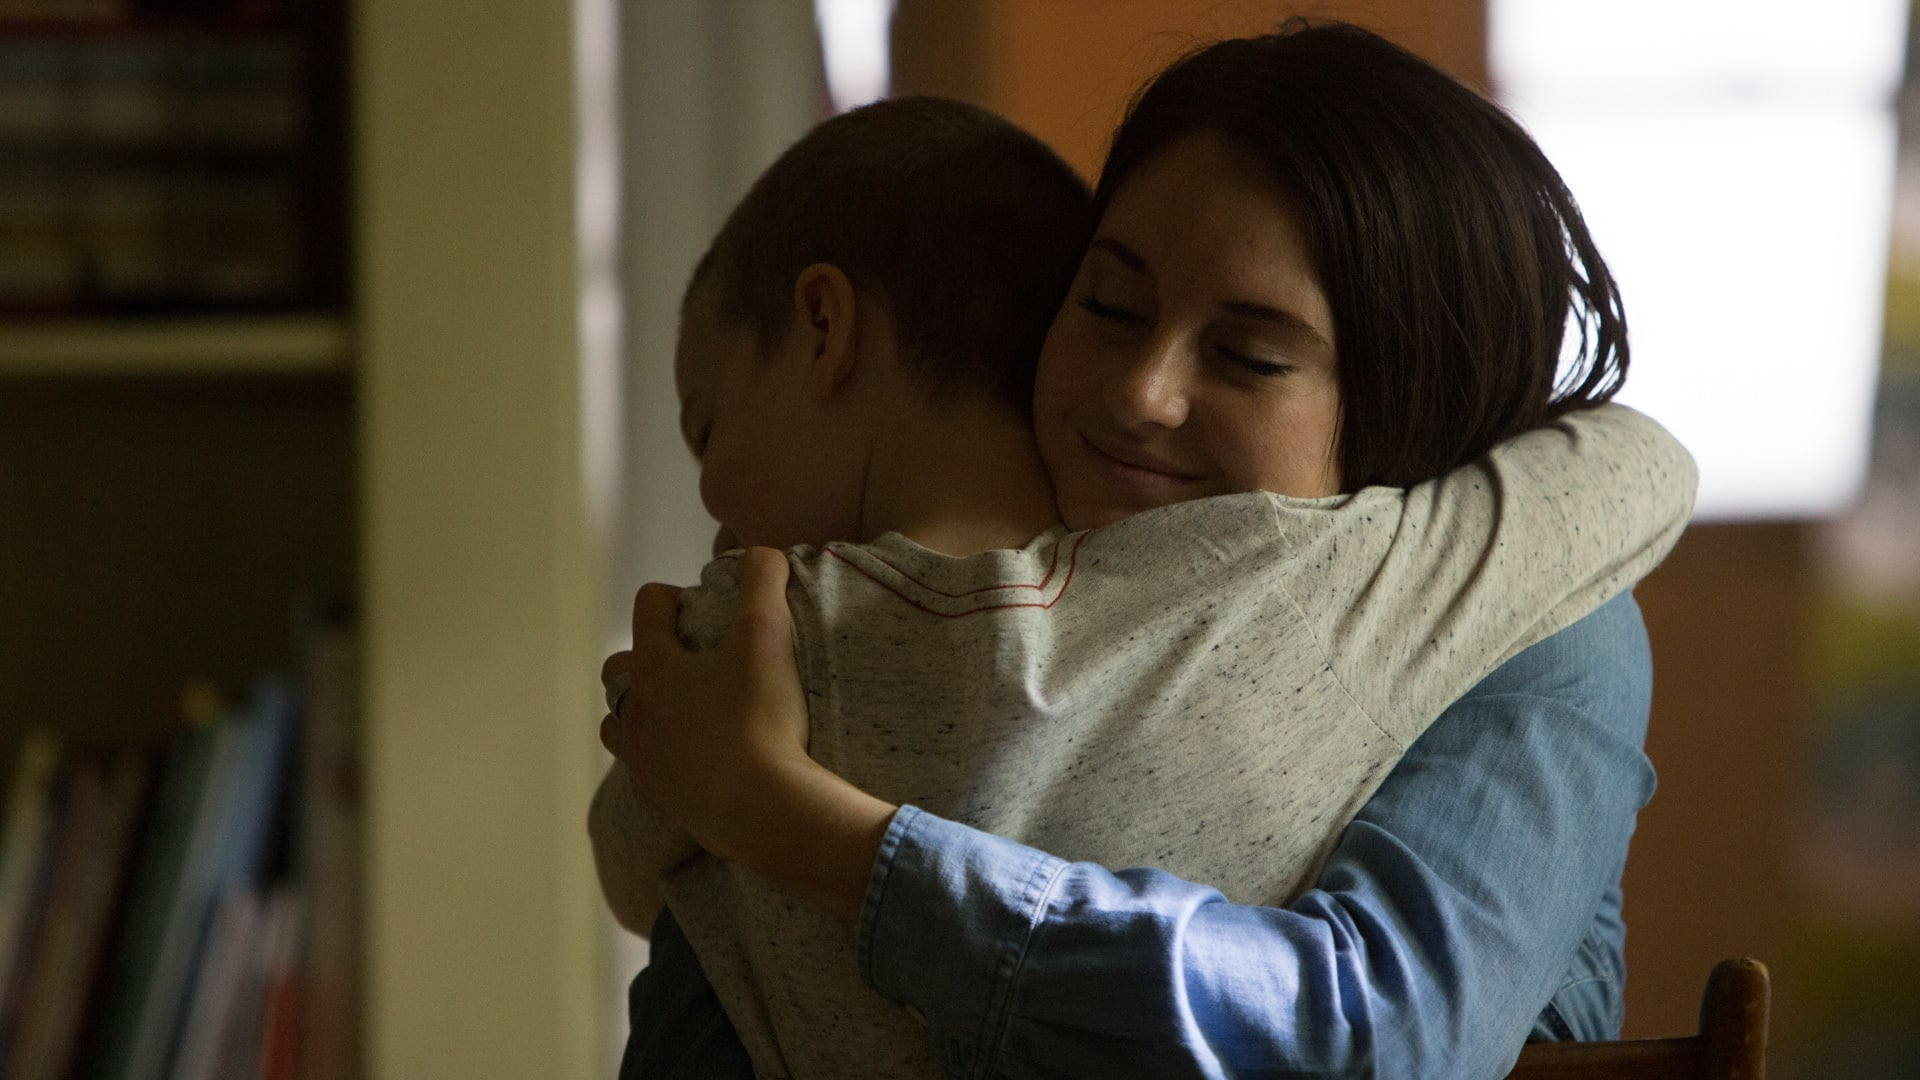 watch Big Little Lies Season 1 Episode 6 online free